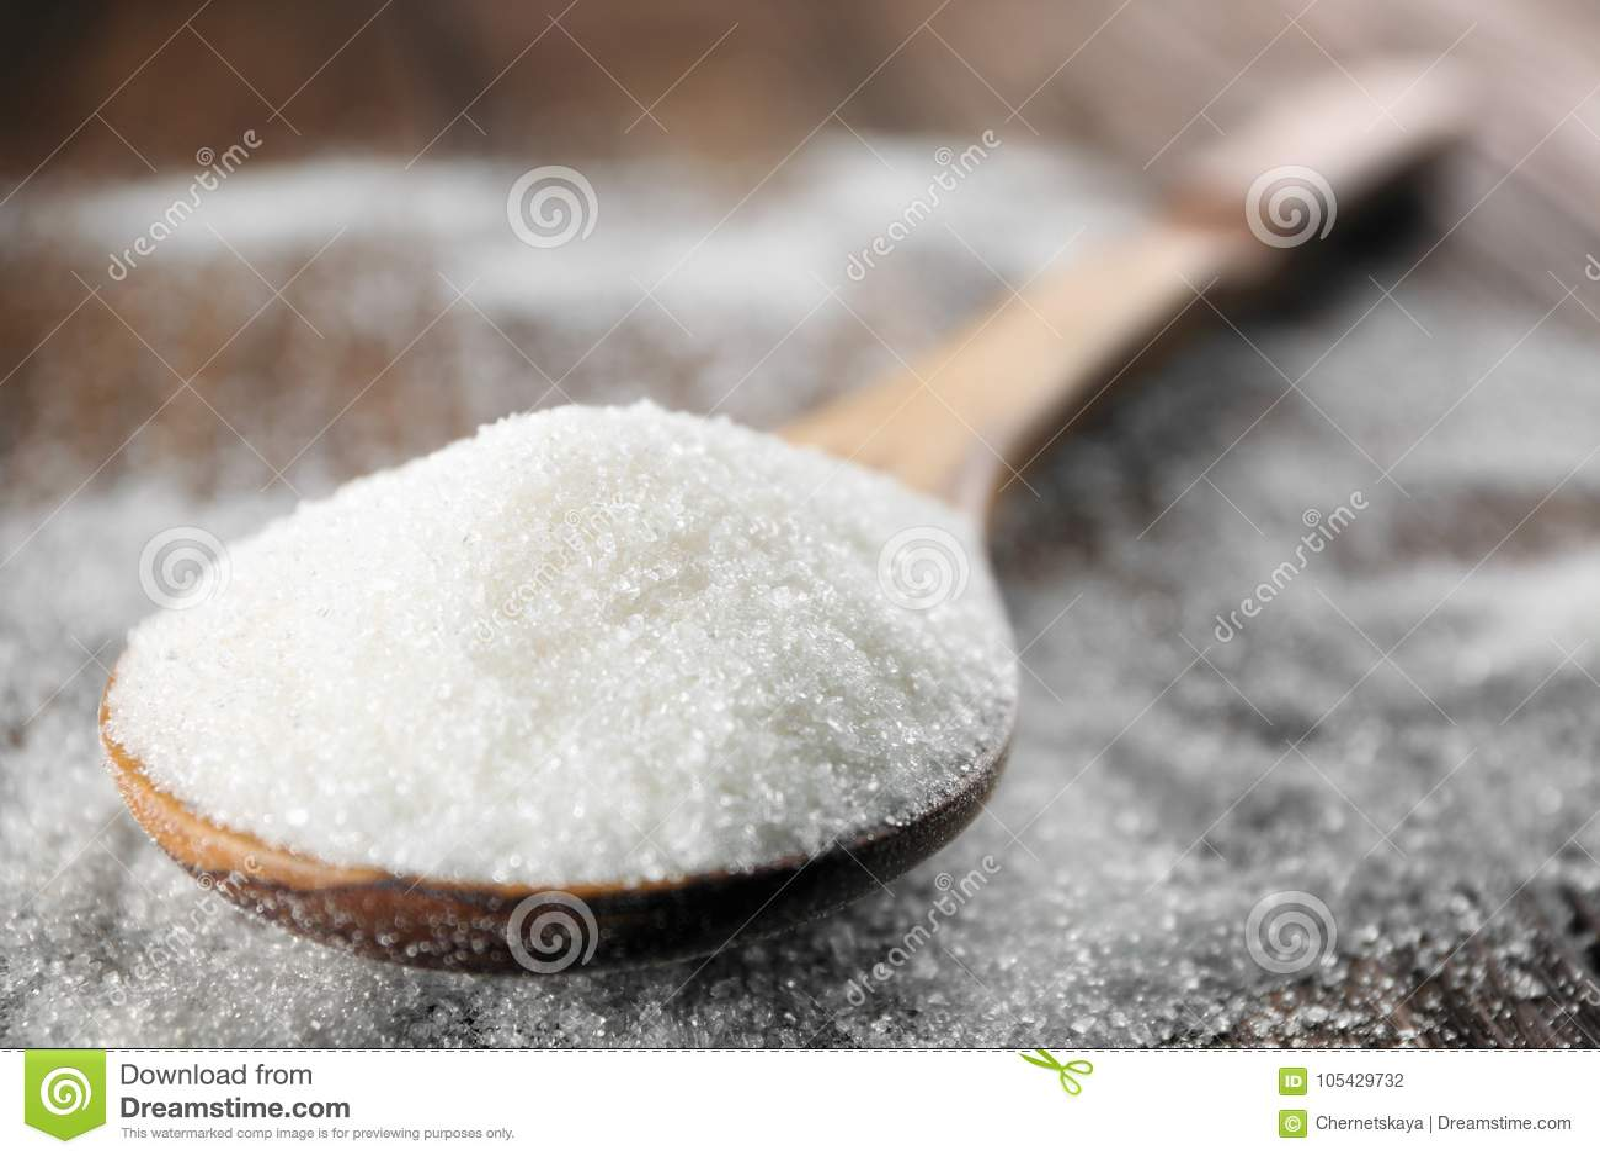 Lepel met witte suiker